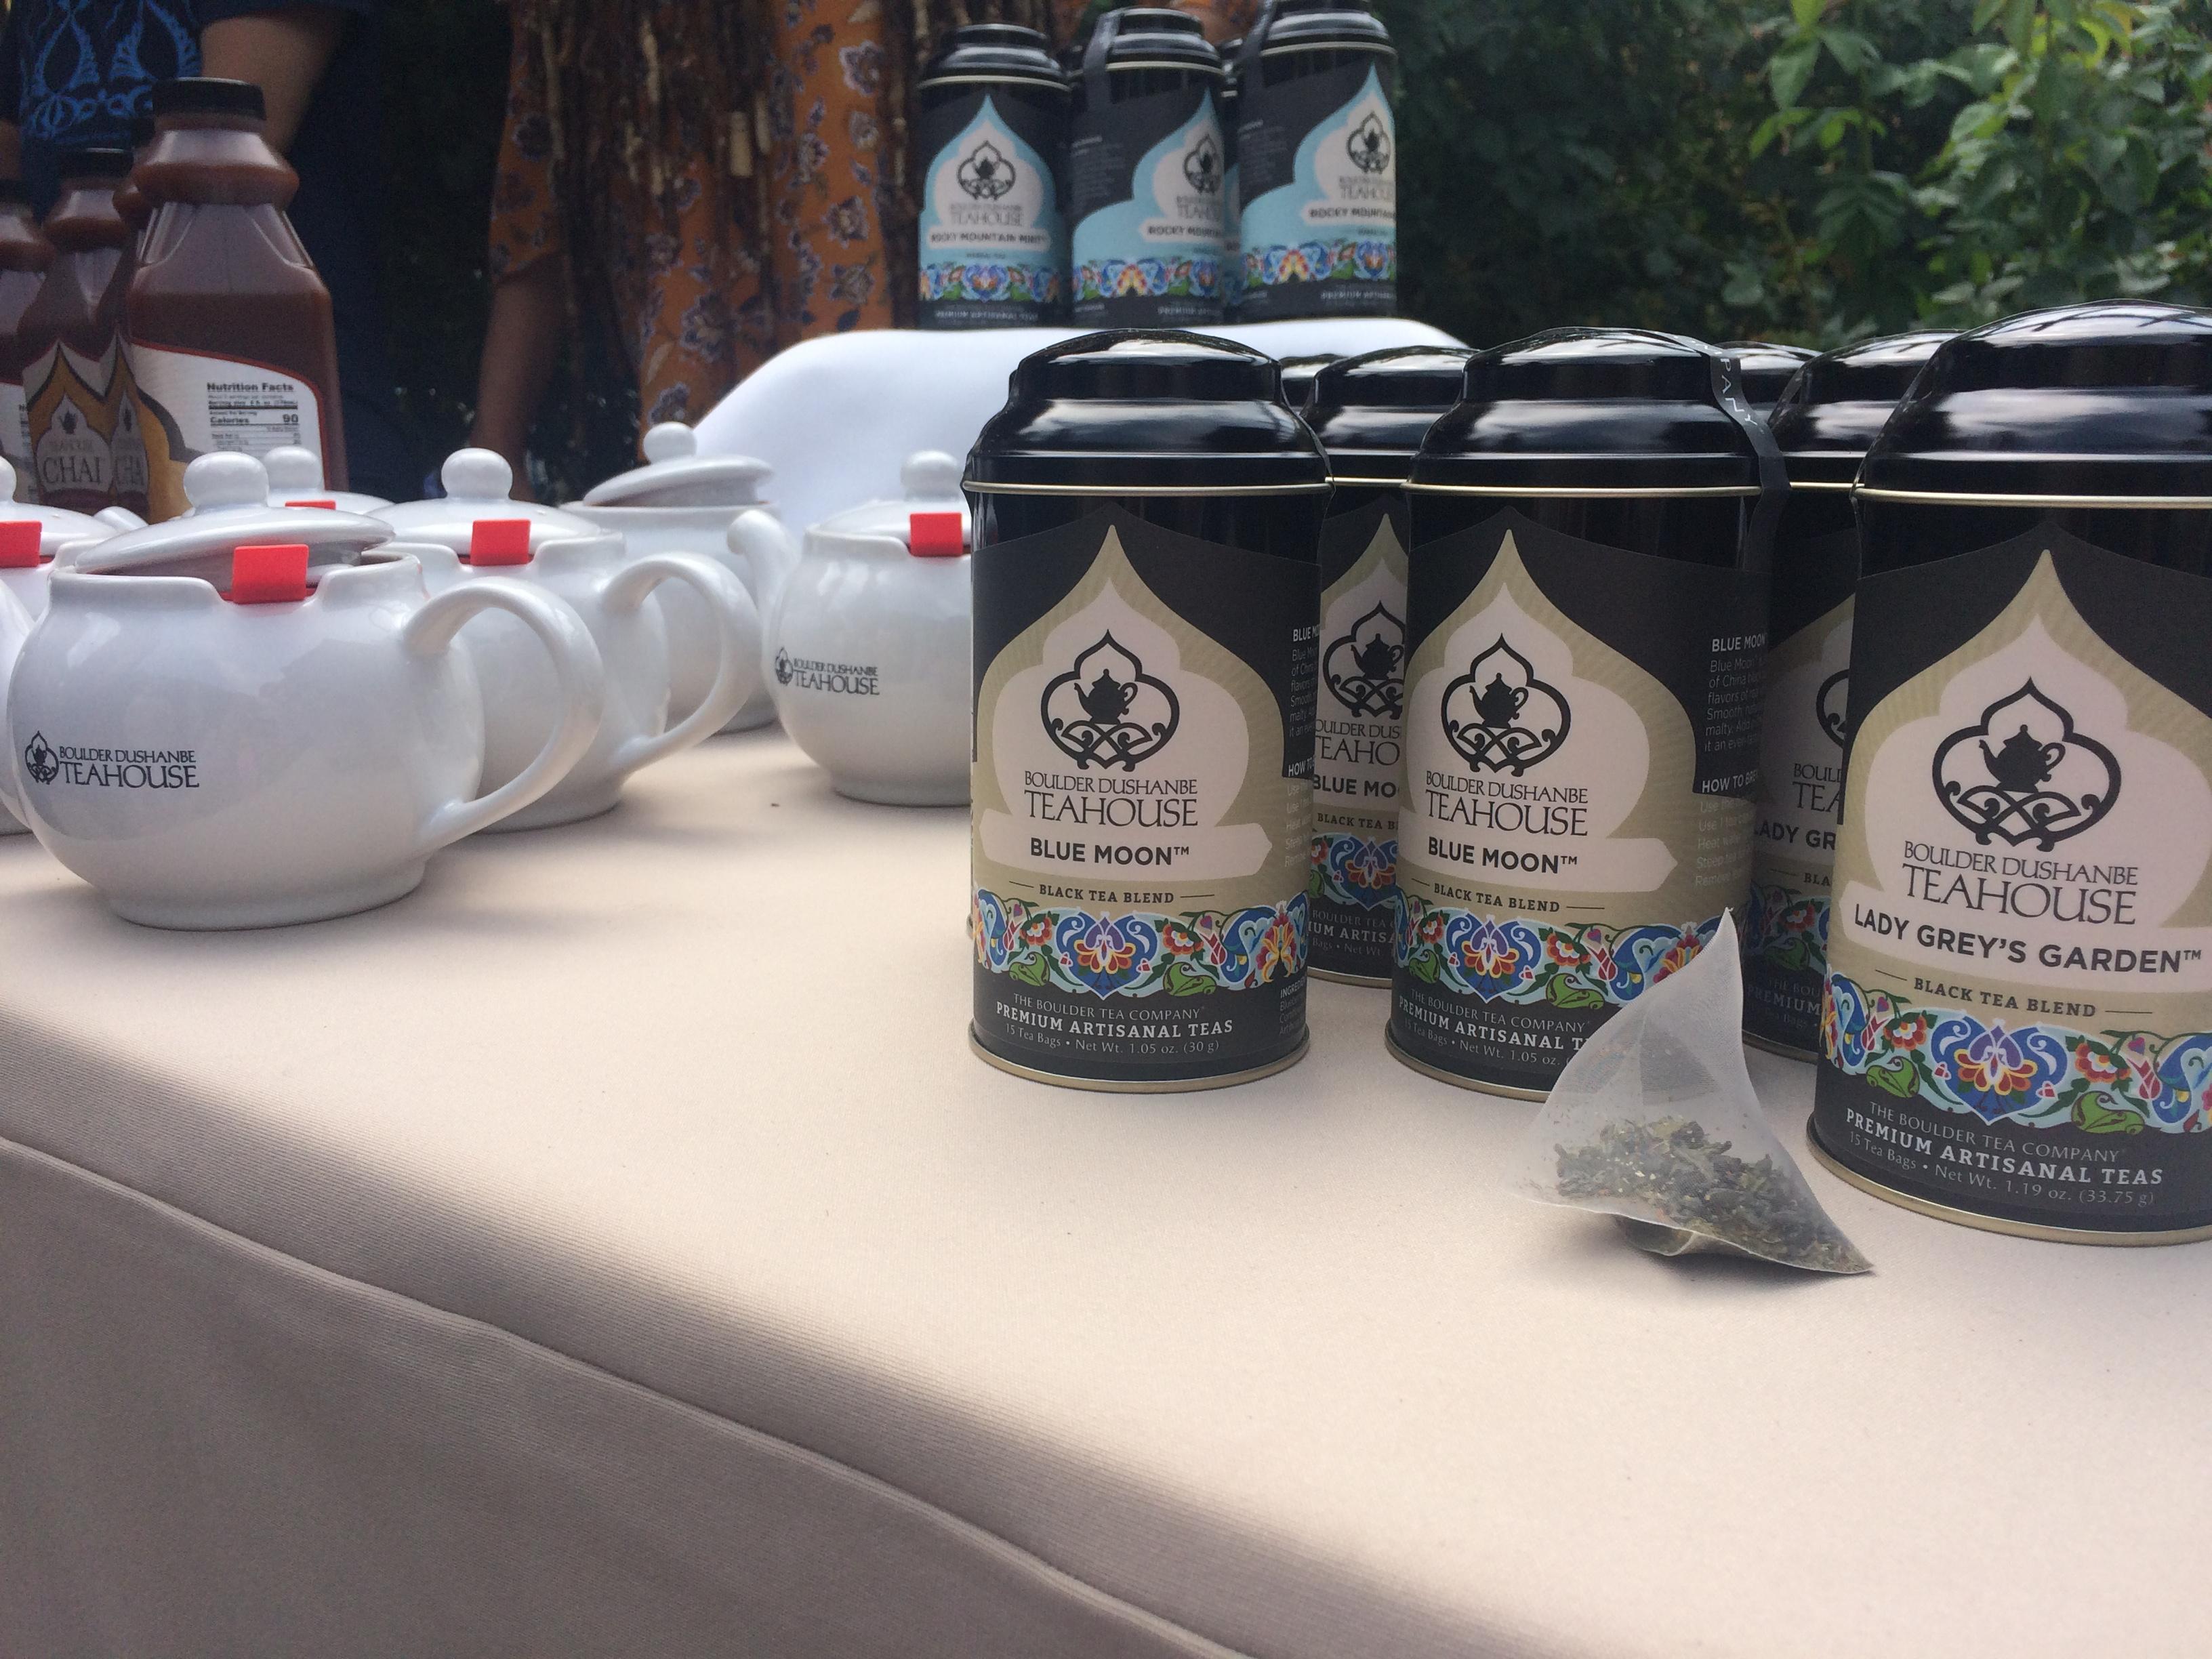 Boulder Dushanbe Teahouse teas and teapots